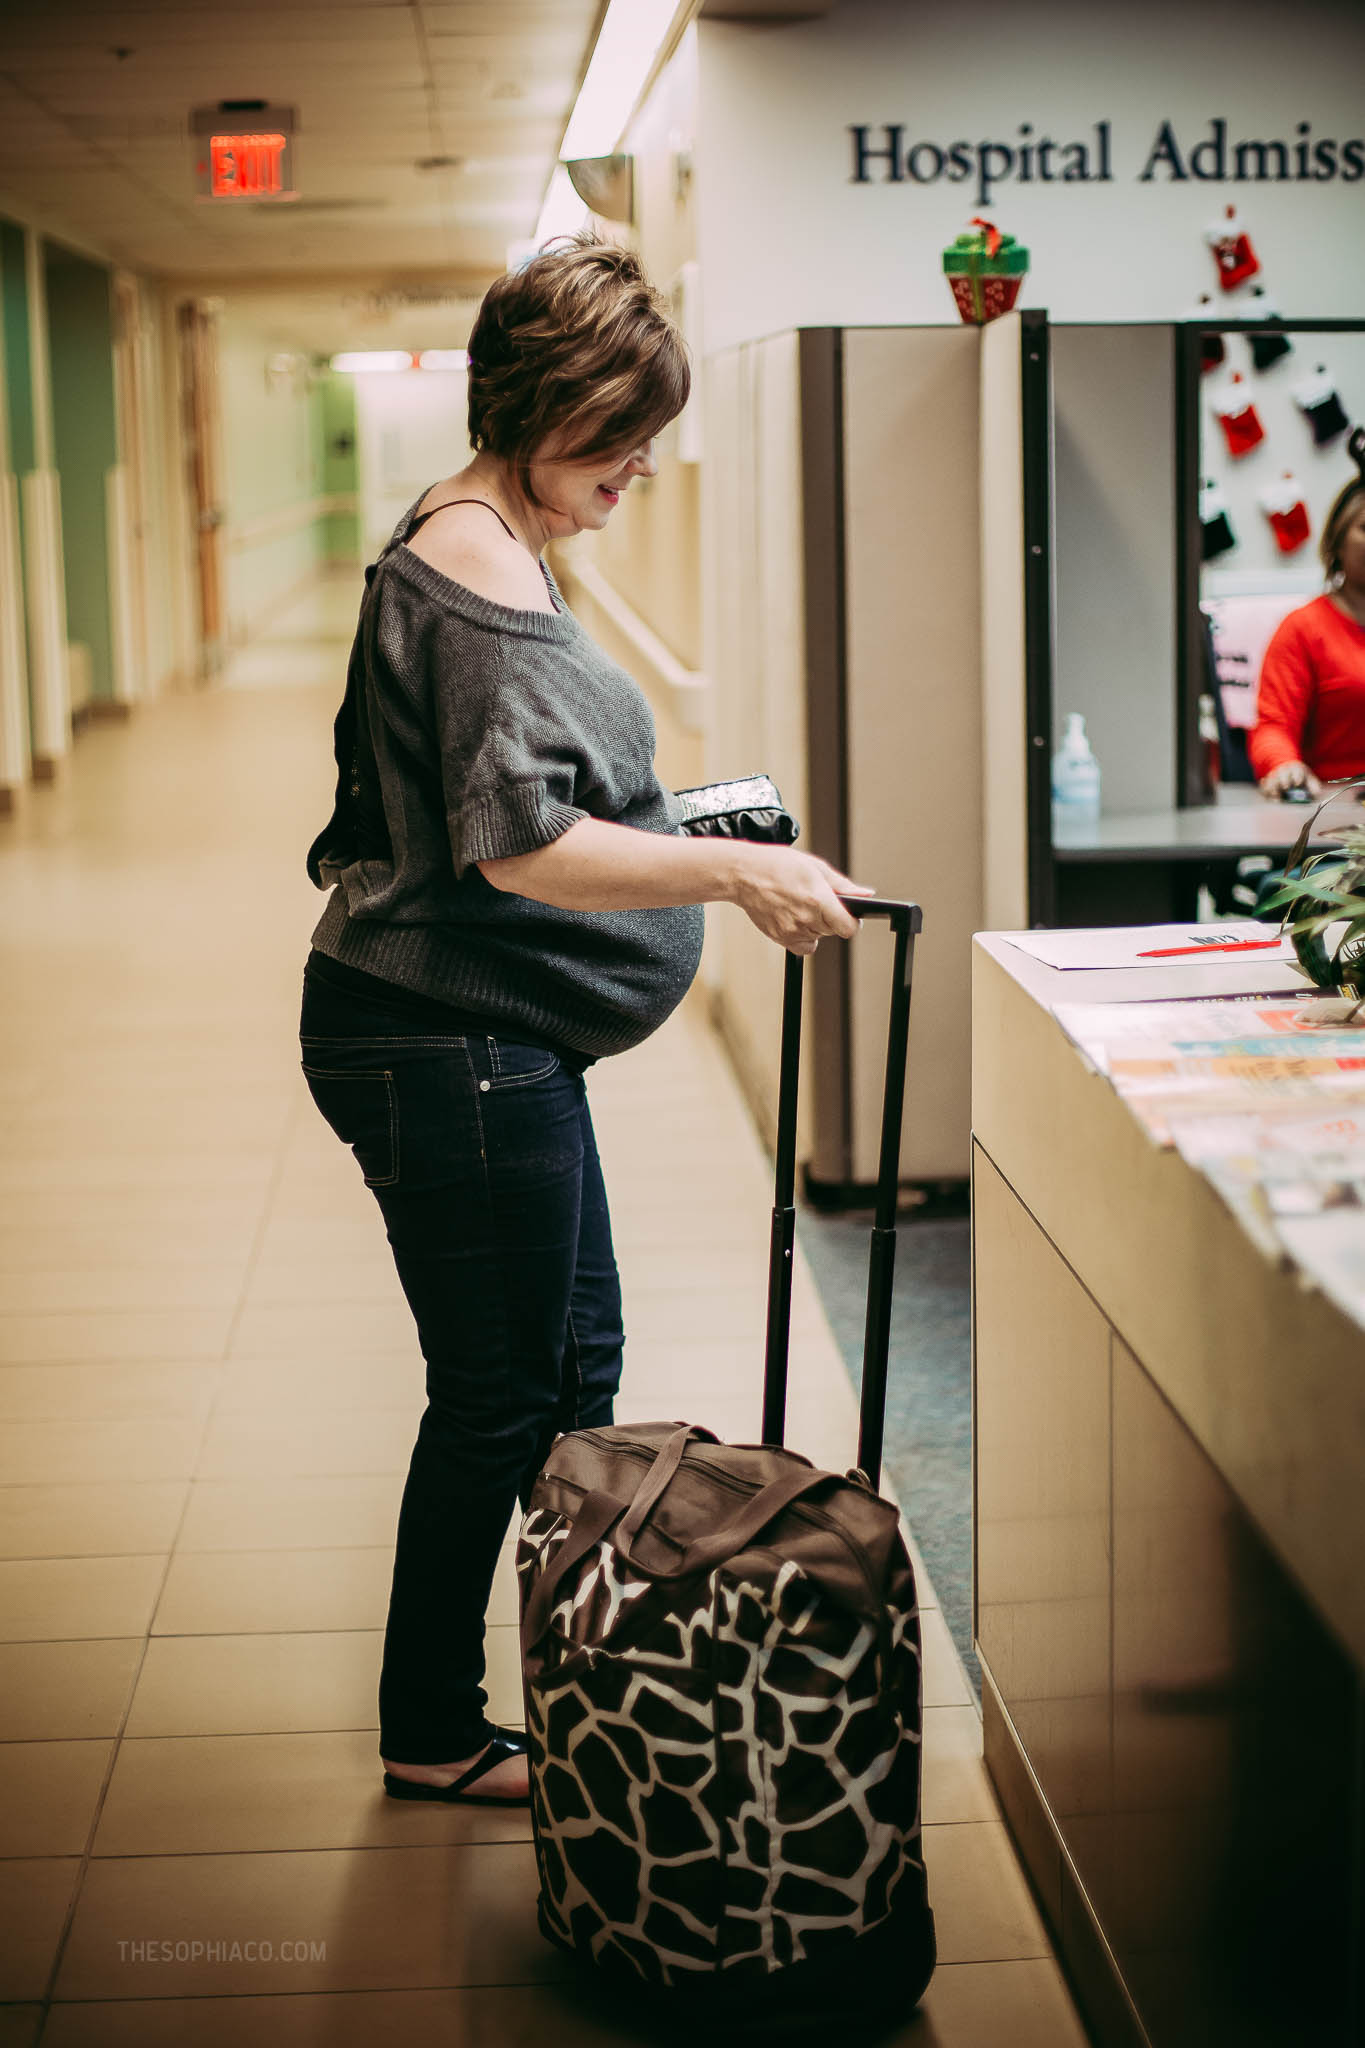 Oahu-Birth-Photographer-scheduled-cesarean-kaiser-02.jpg